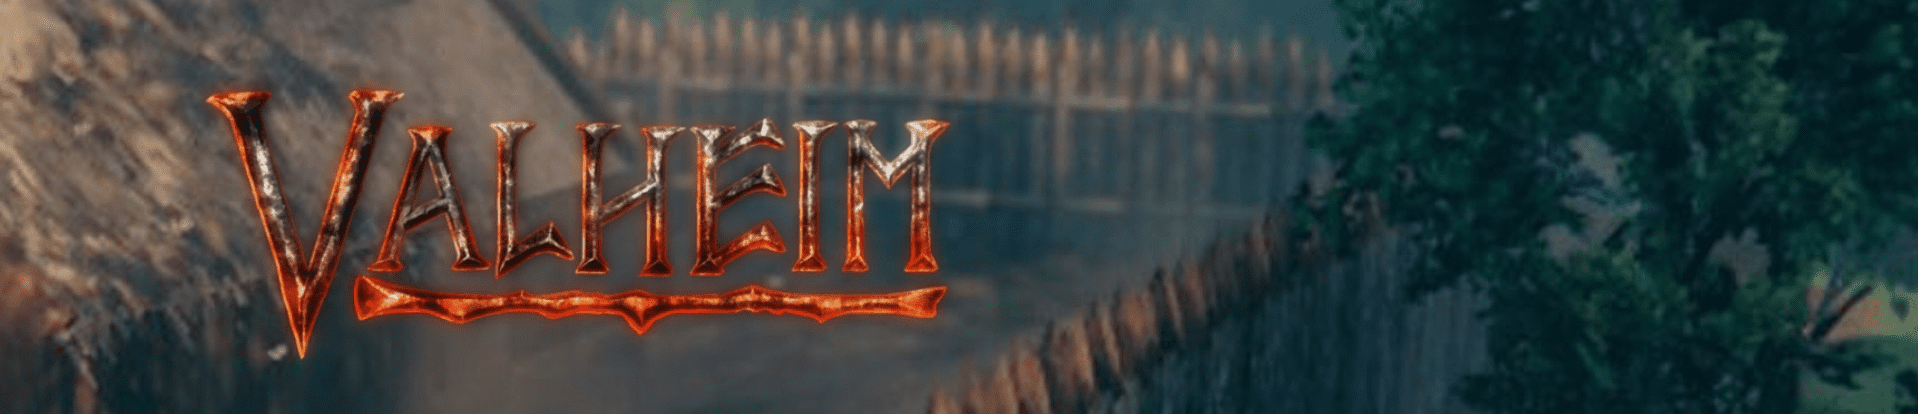 valheim-game-servers